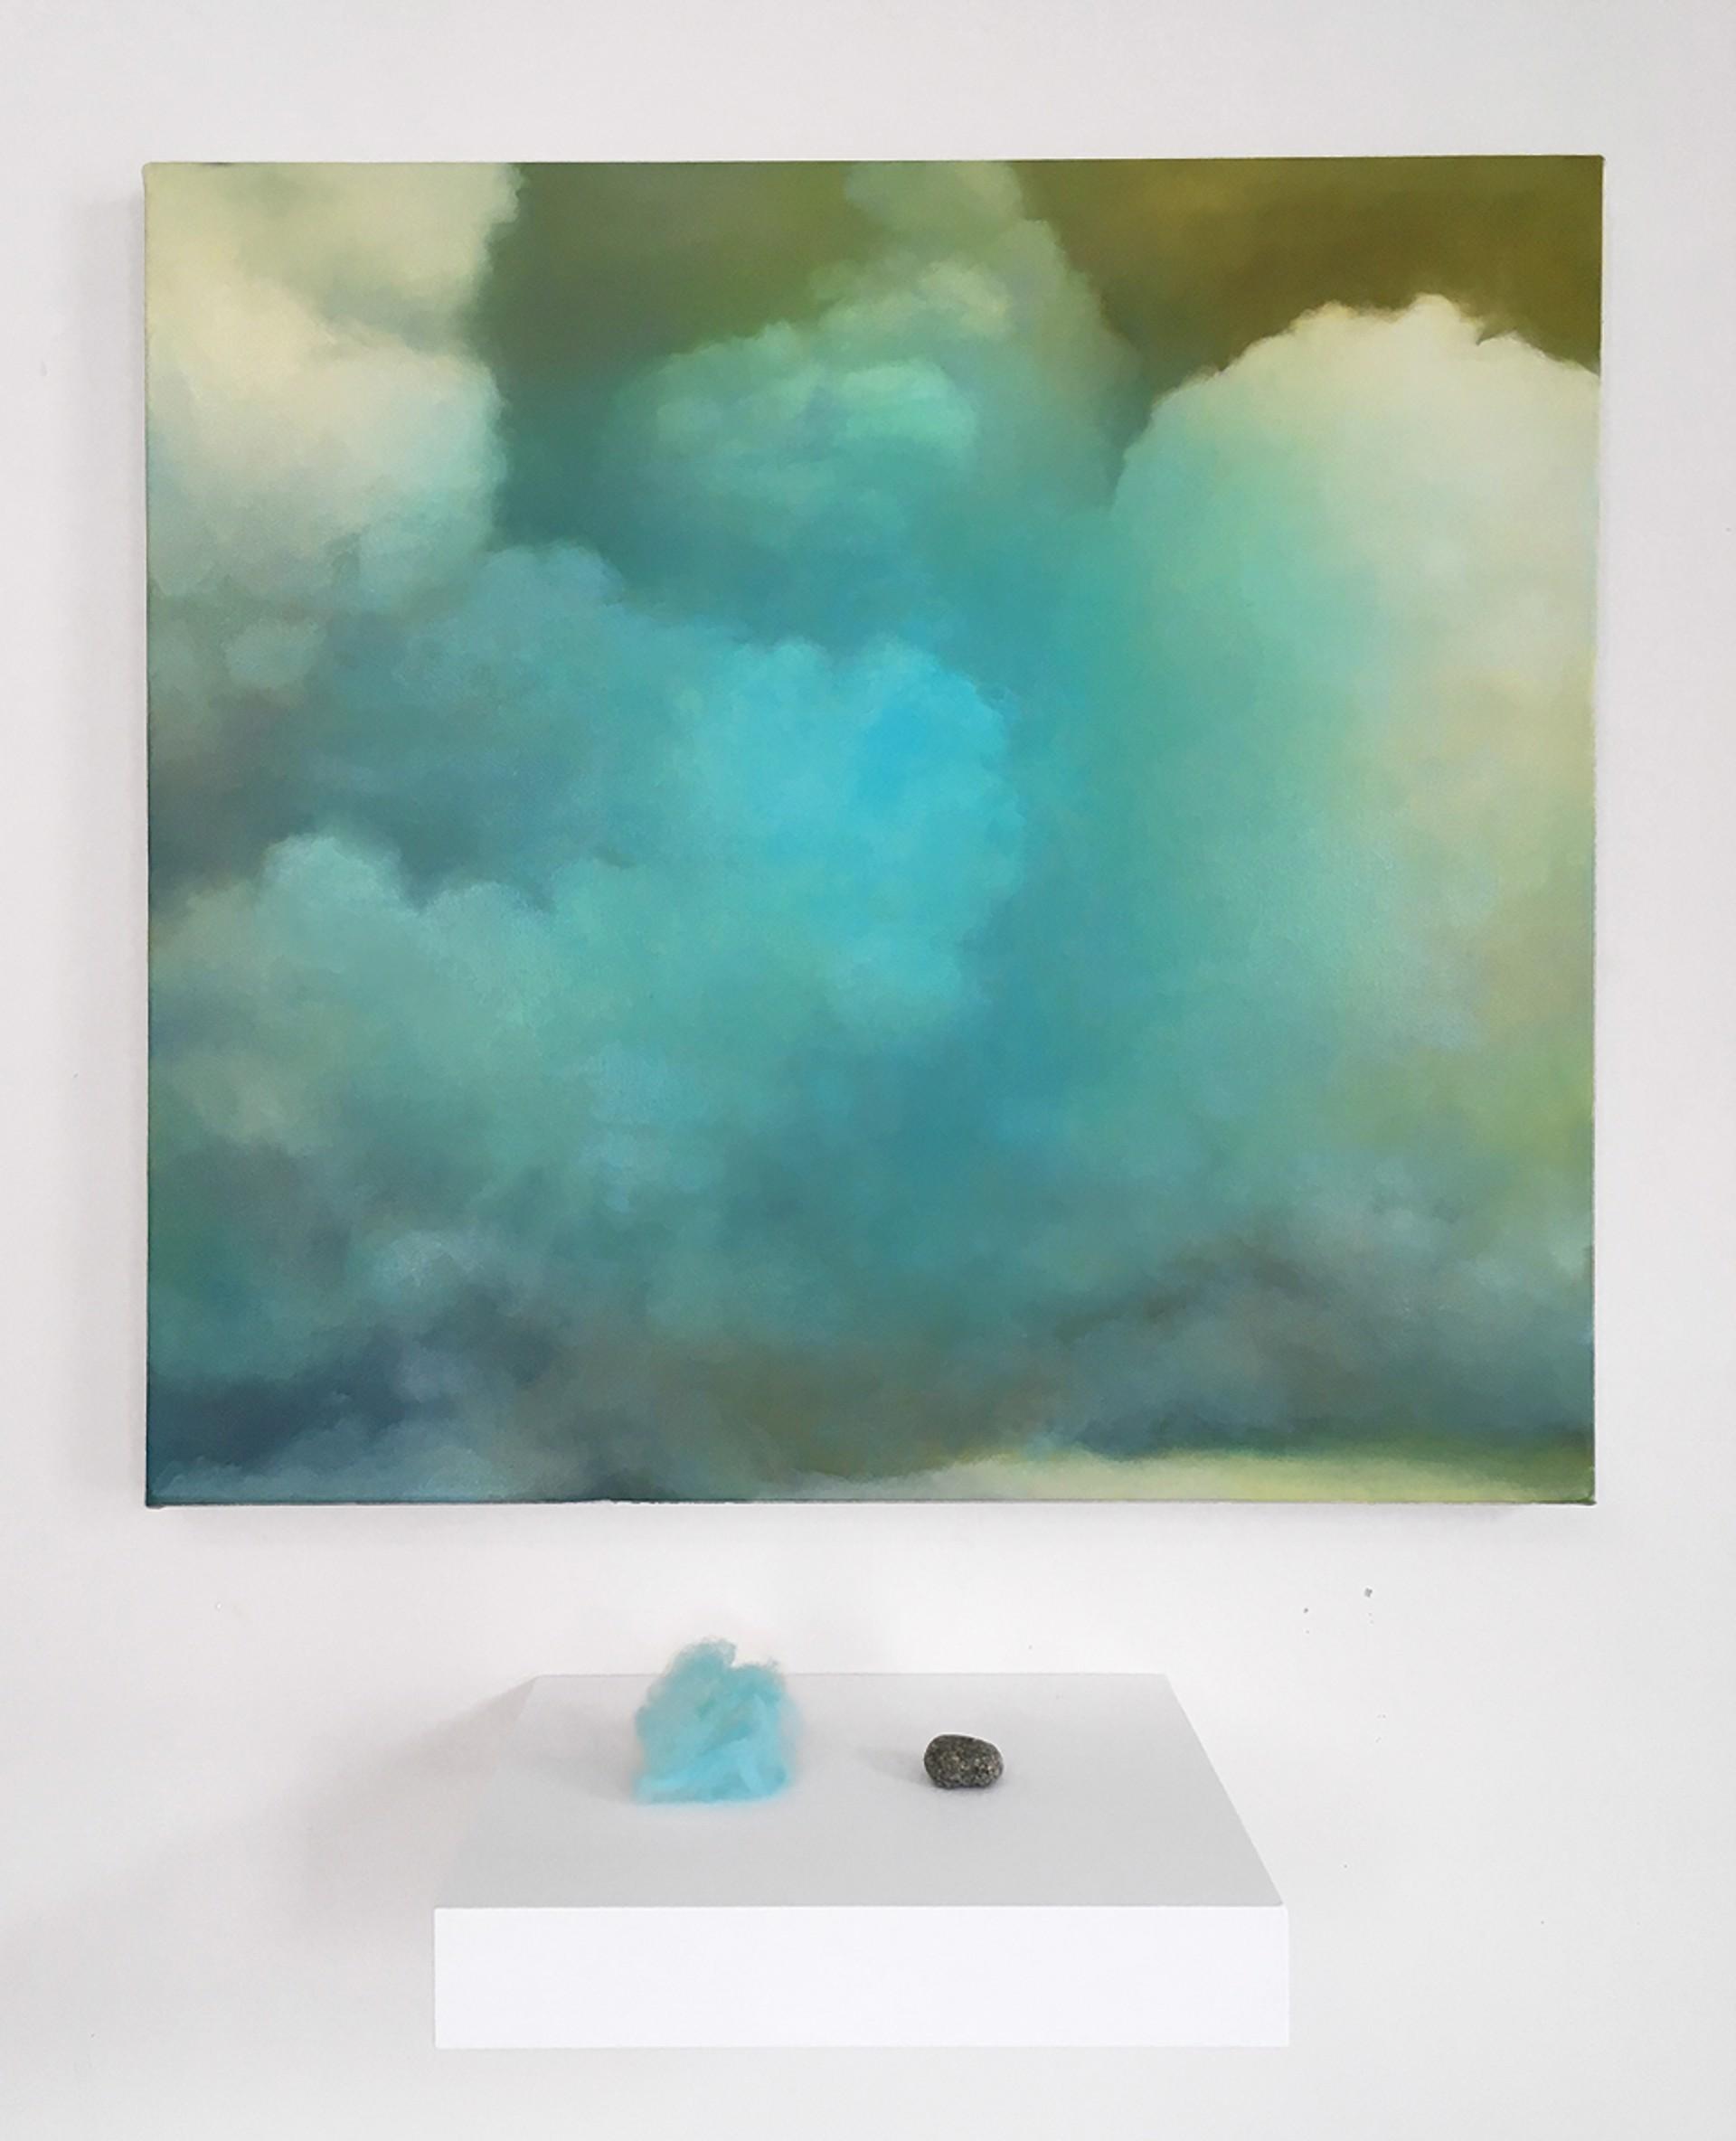 Fundamental Particles by Ashley Eliza Williams